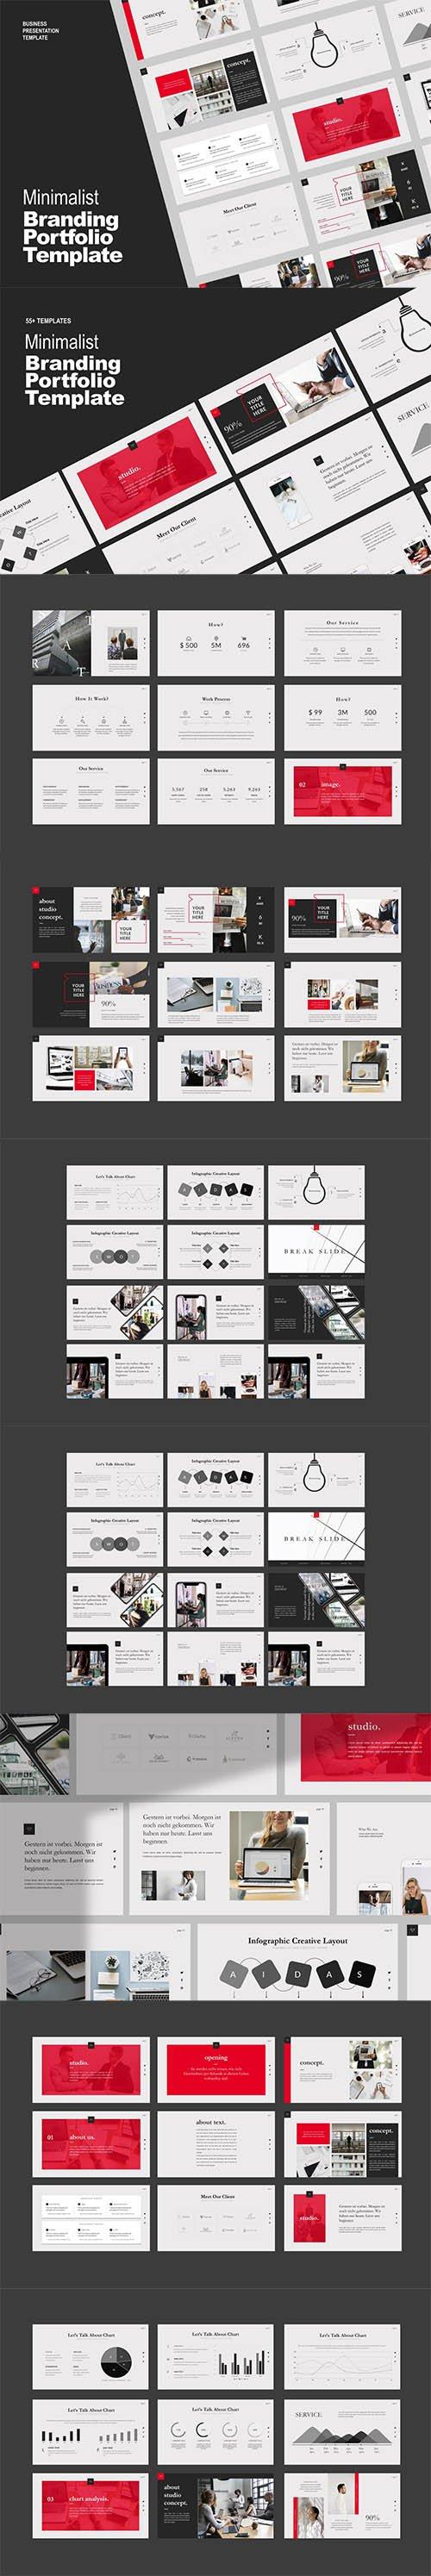 Studio Business Portfolio Powerpoint, Keynote and Google Slide Template